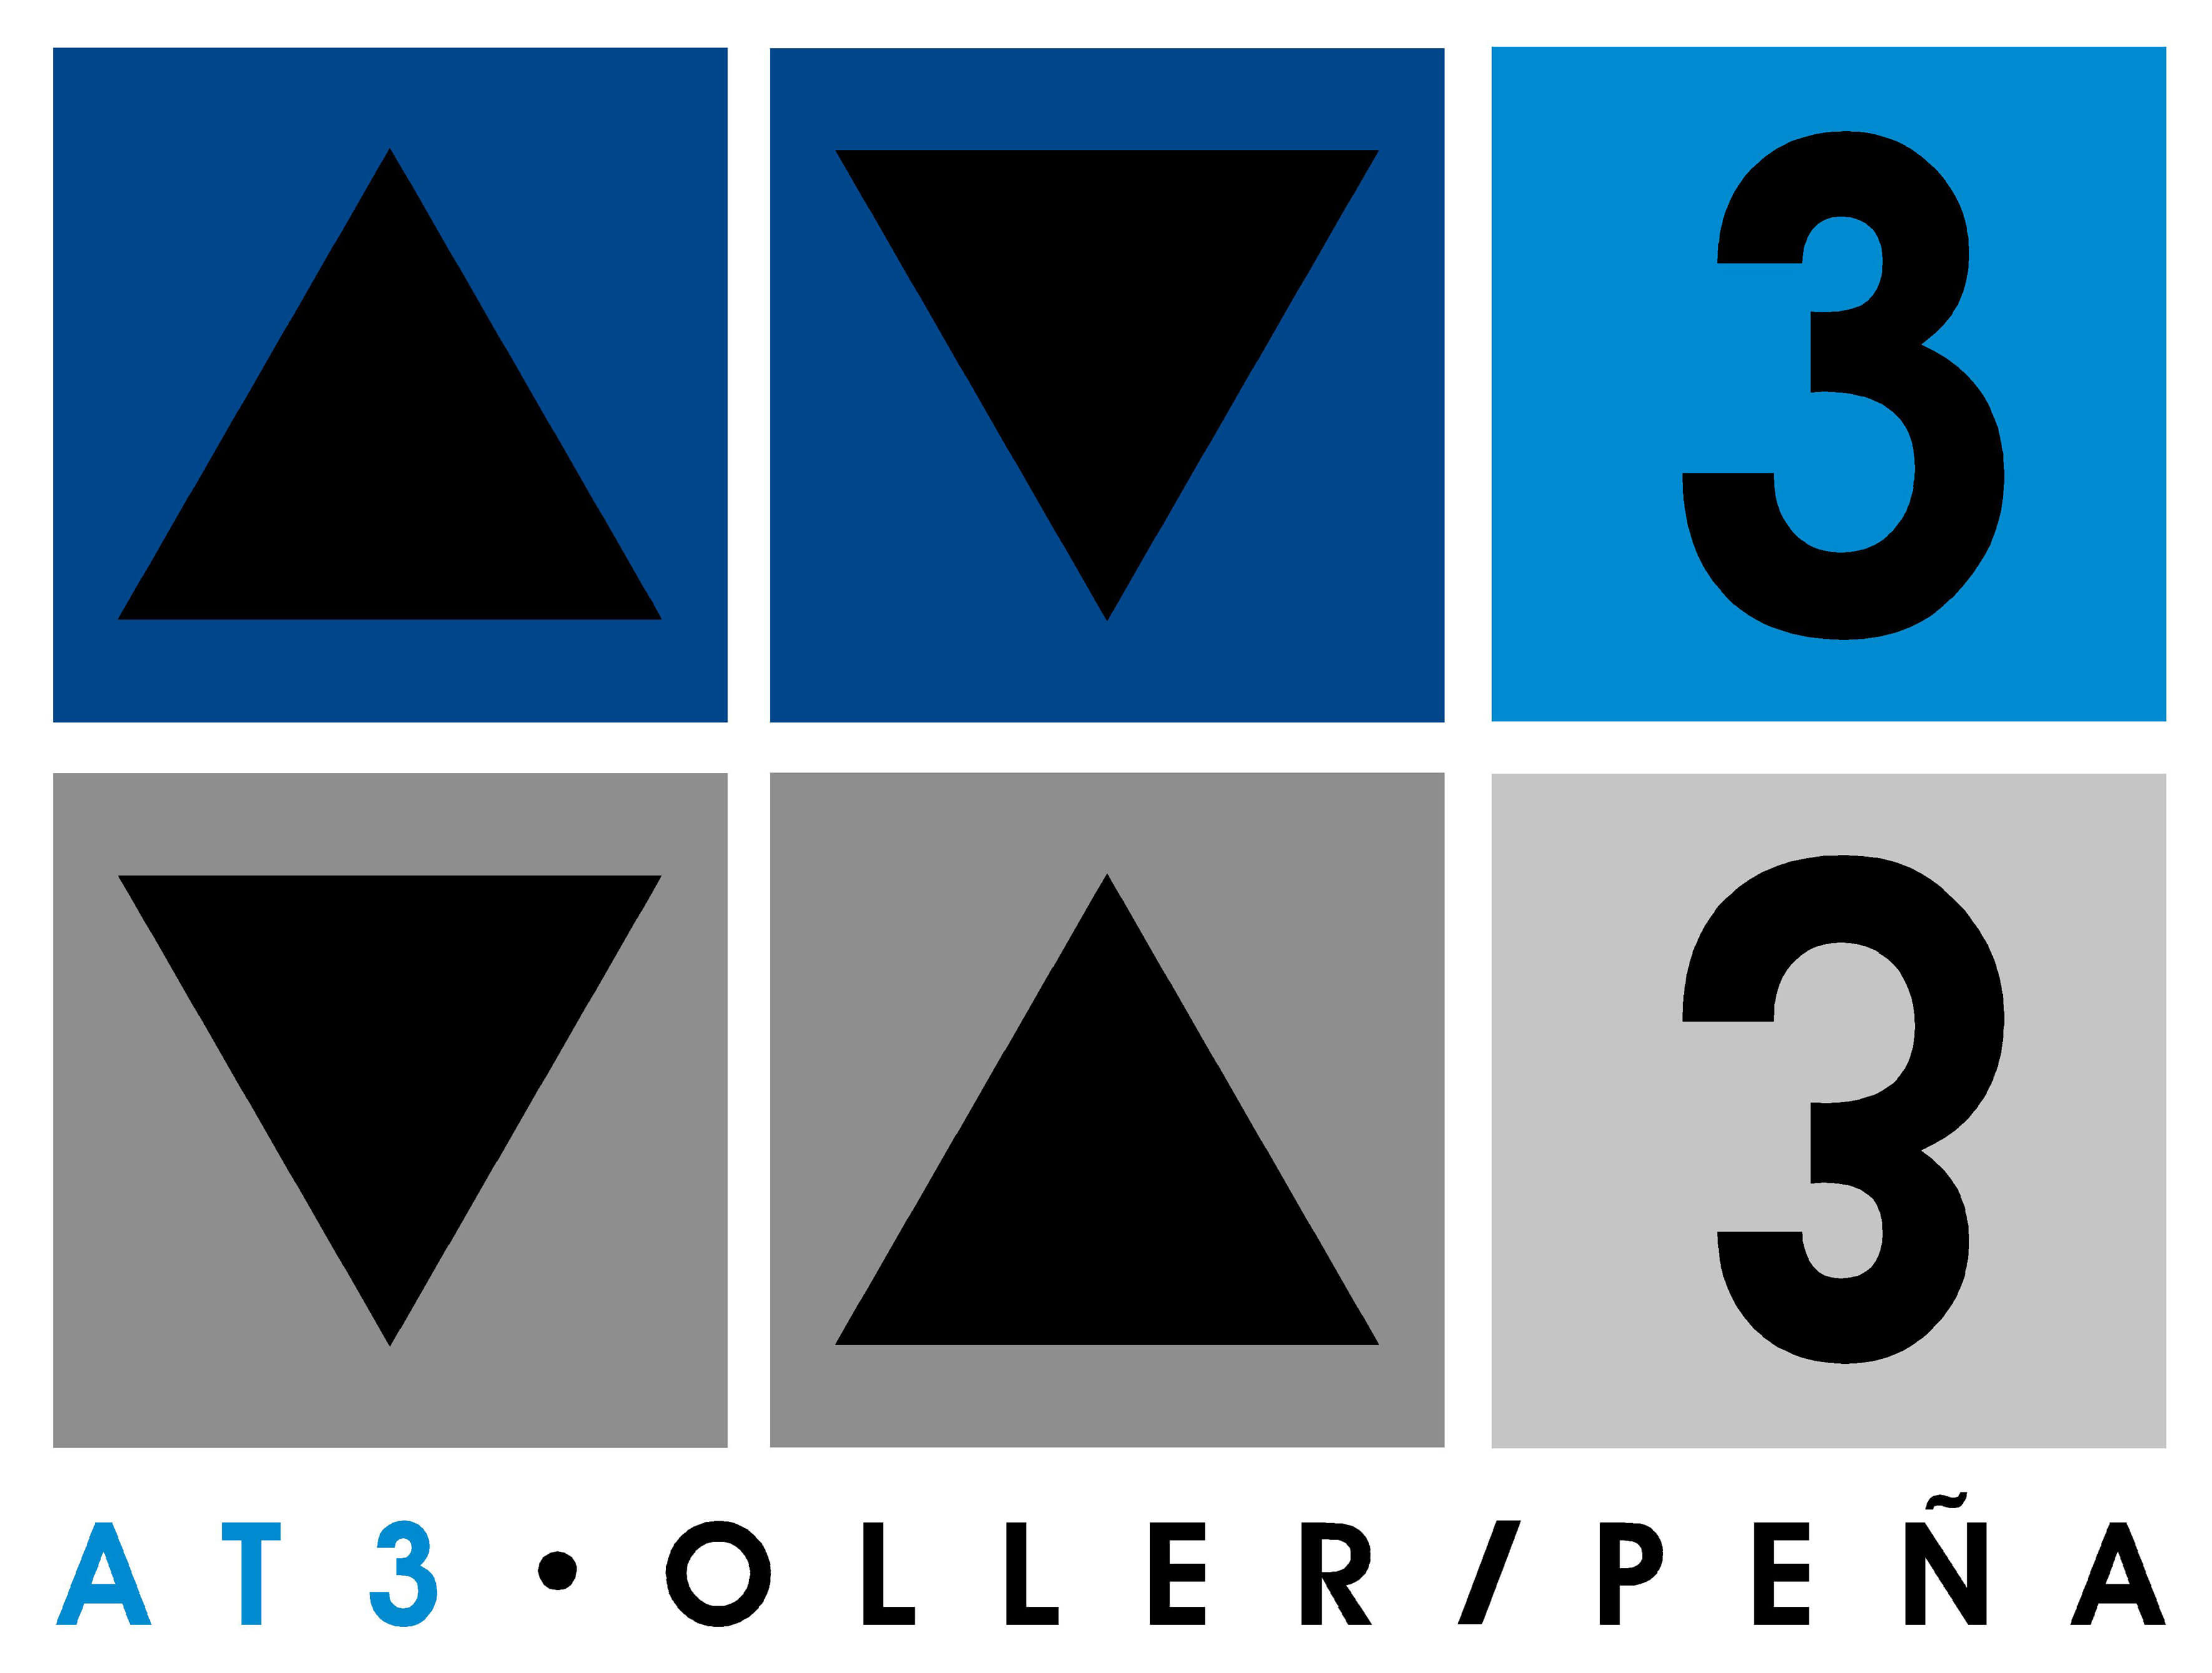 AT3 Oller-Peña